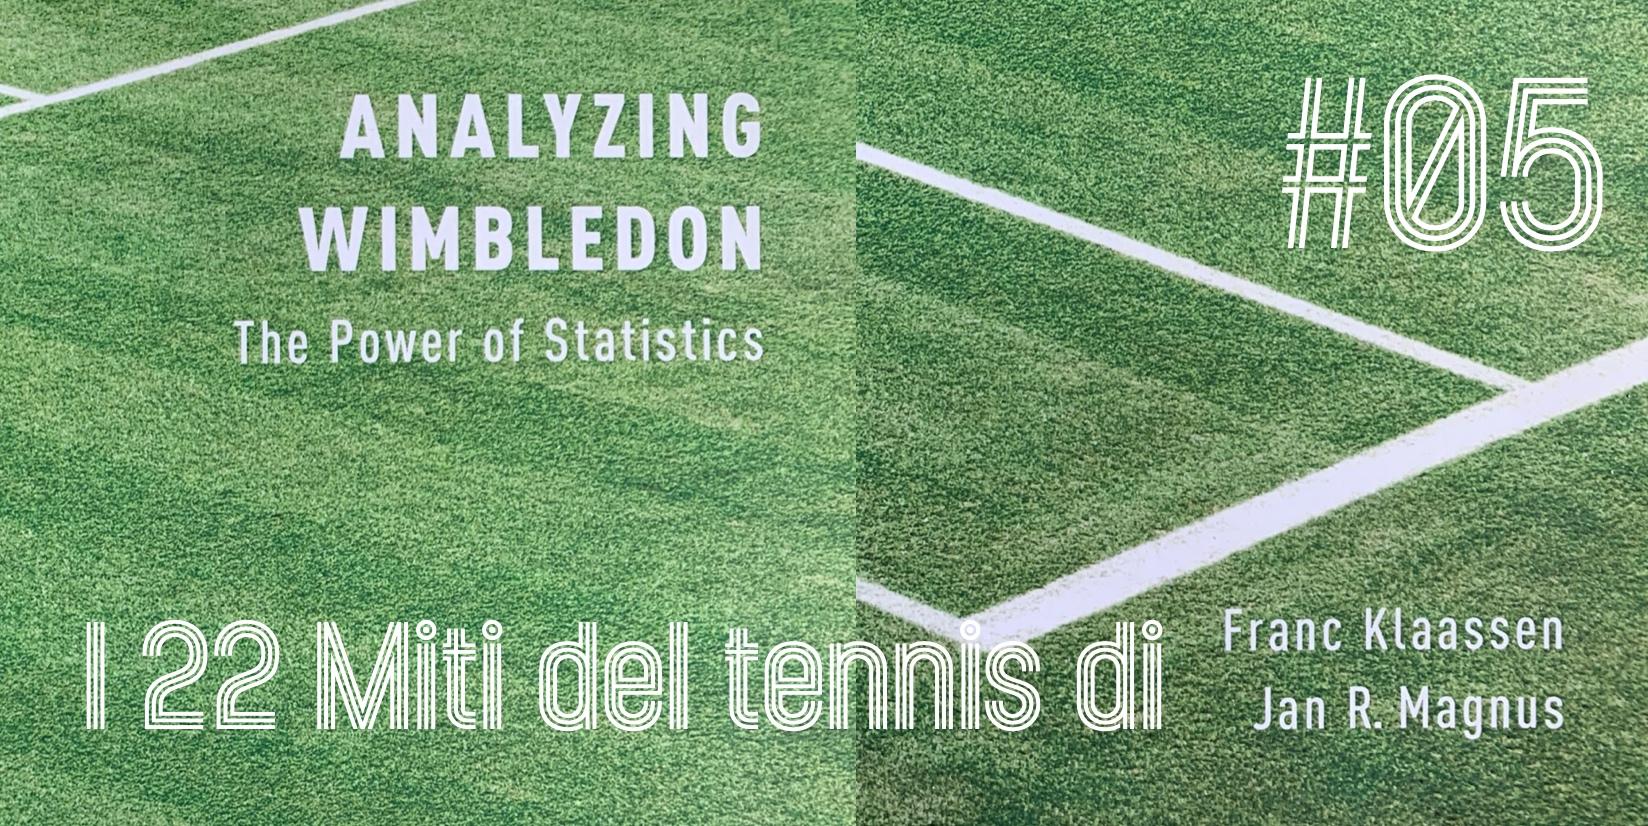 I 22 miti del tennis di Klaassen & Magnus – Mito 5 - settesei.it